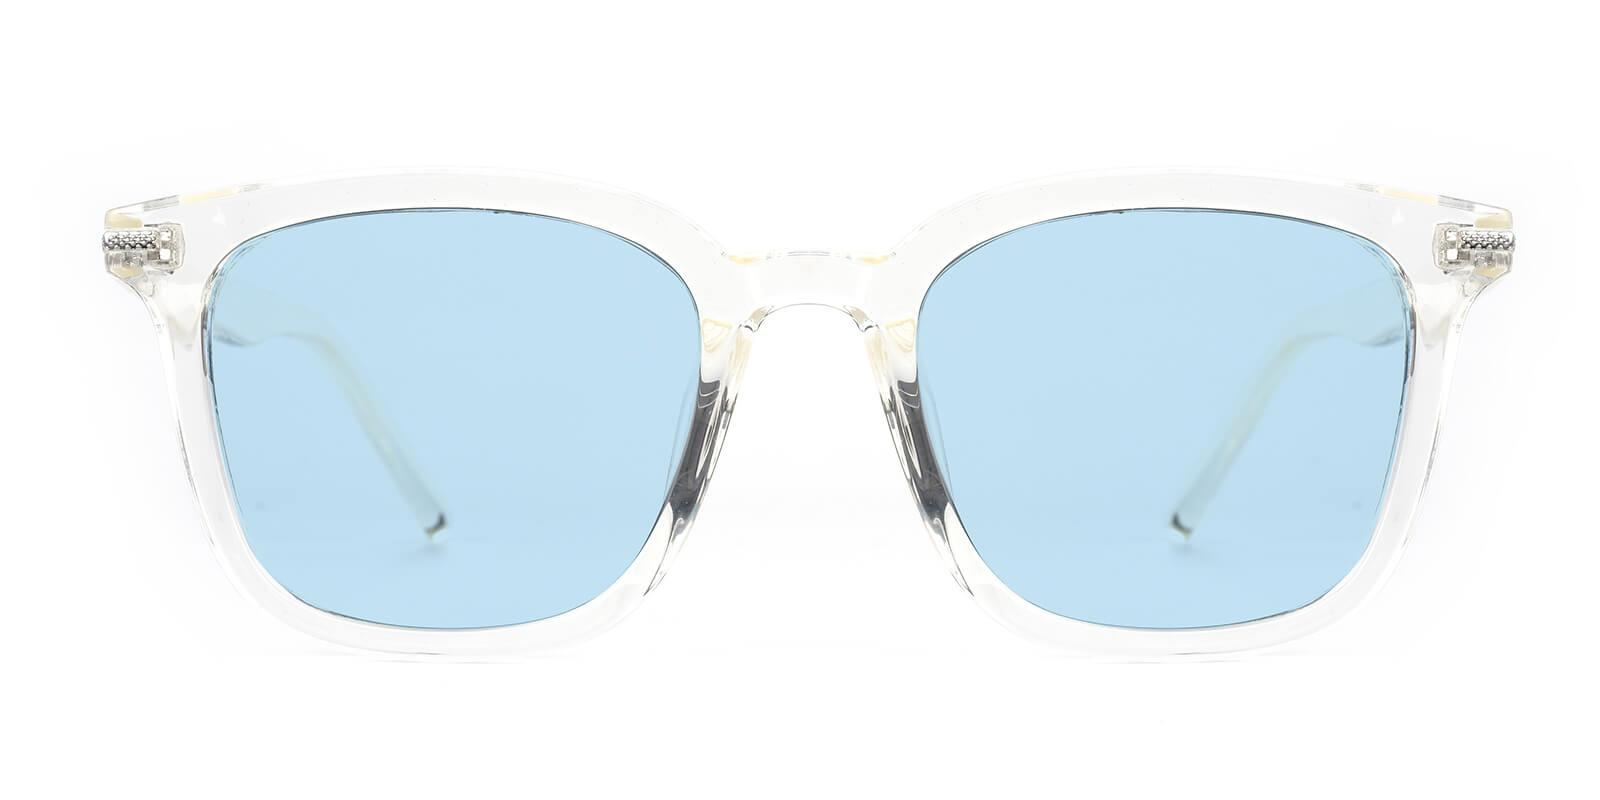 Mark-Translucent-Square-TR-Sunglasses-additional2